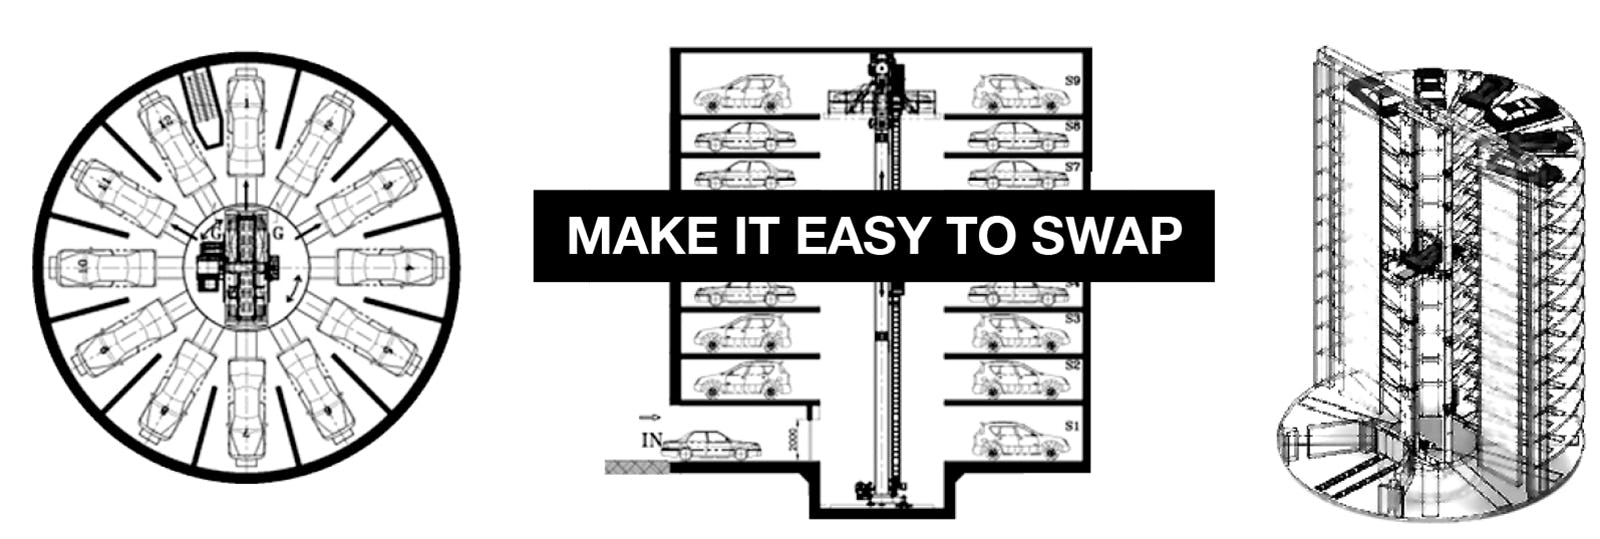 Fantasticoffense fvdc step3 easytoswap